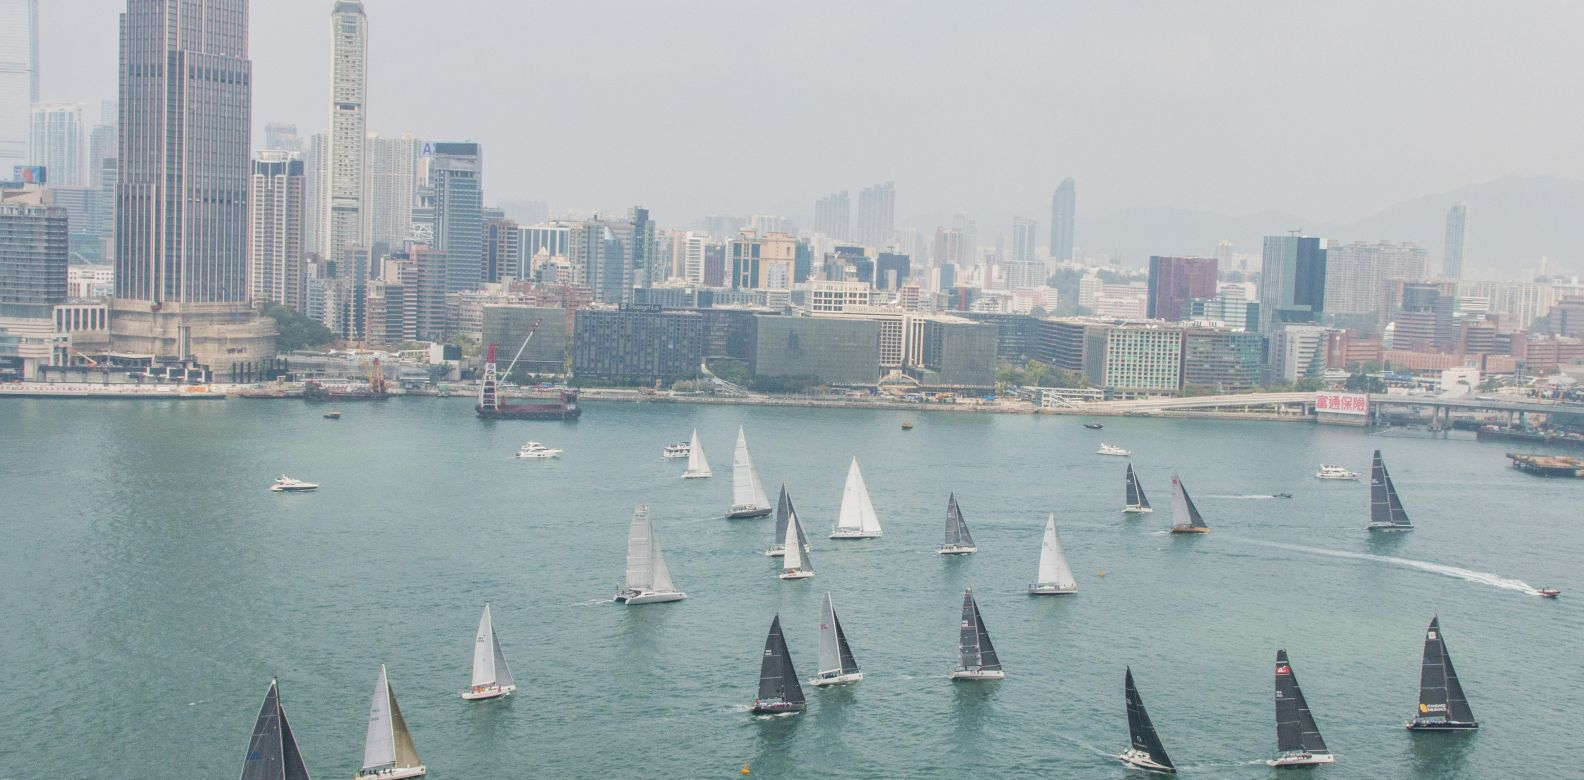 2018勞力士中國海帆船賽正式開始 ©Rolex, Daniel Forster